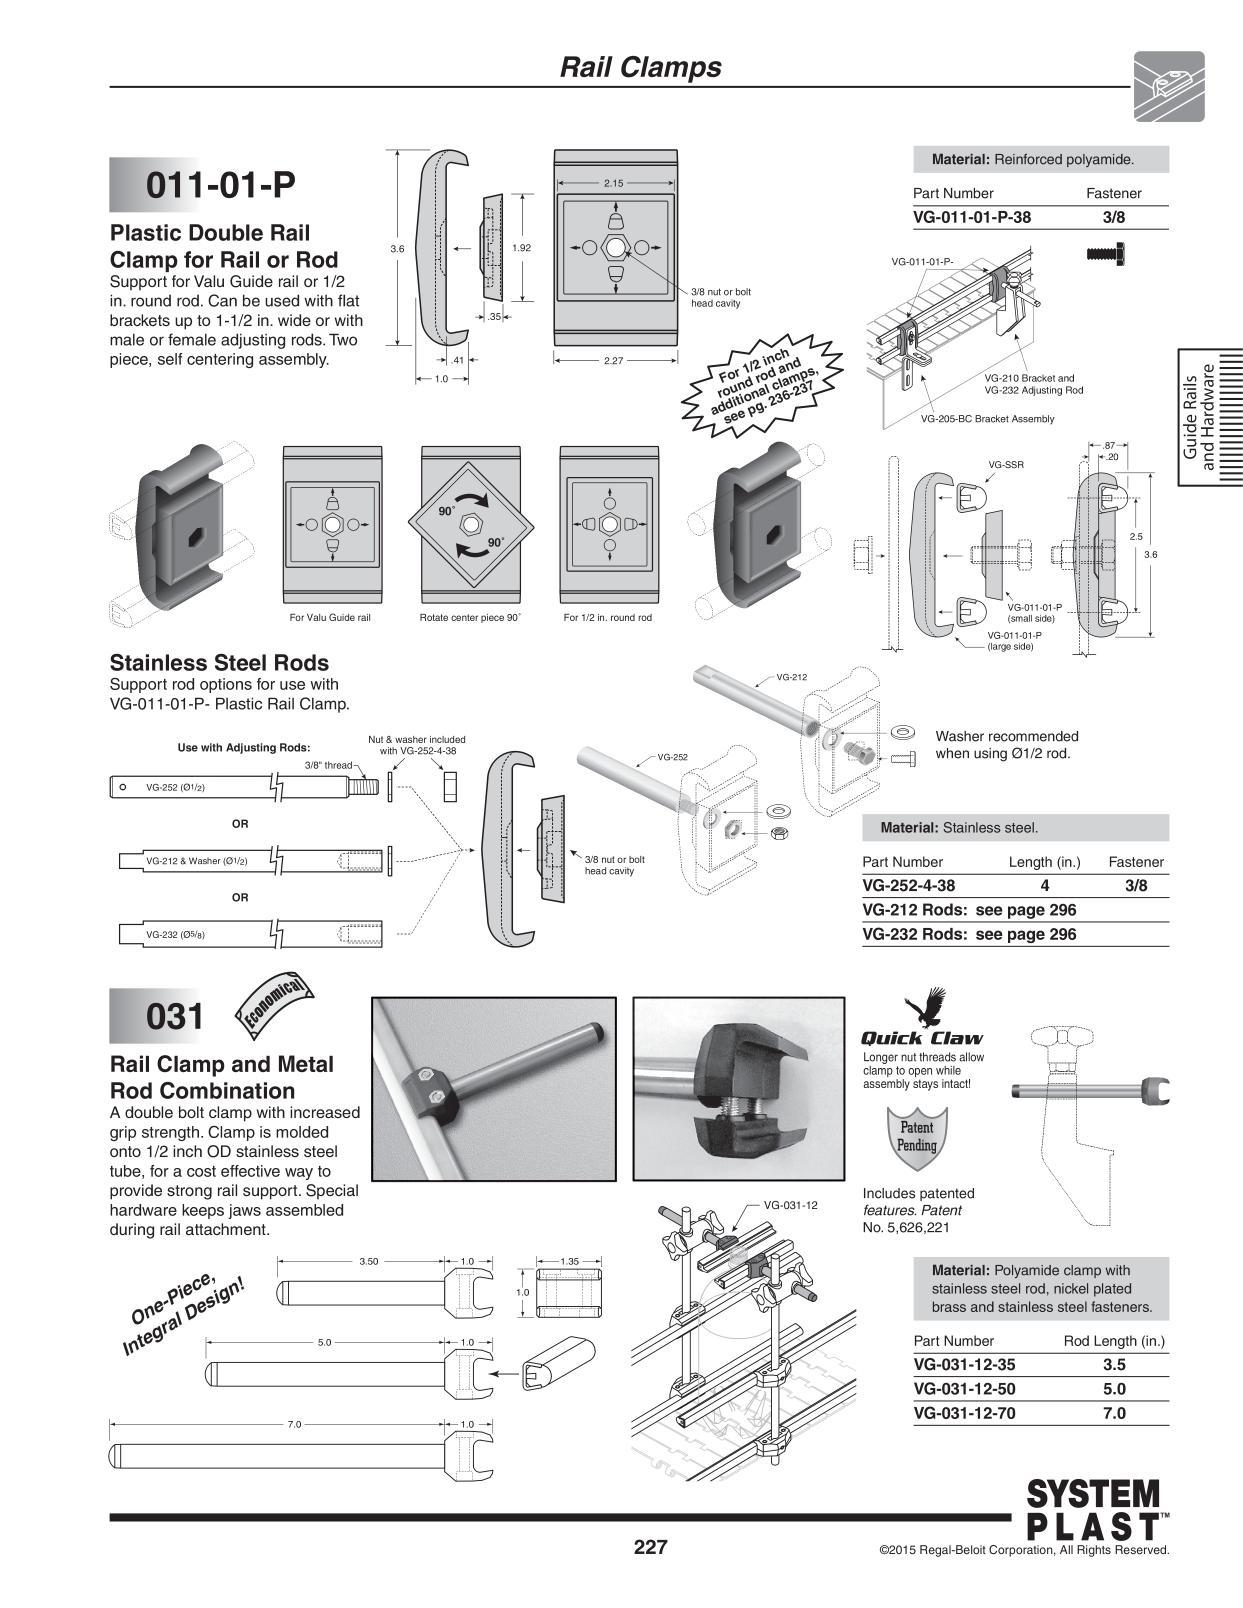 Inspirational Valu Guide Conveyor Rails